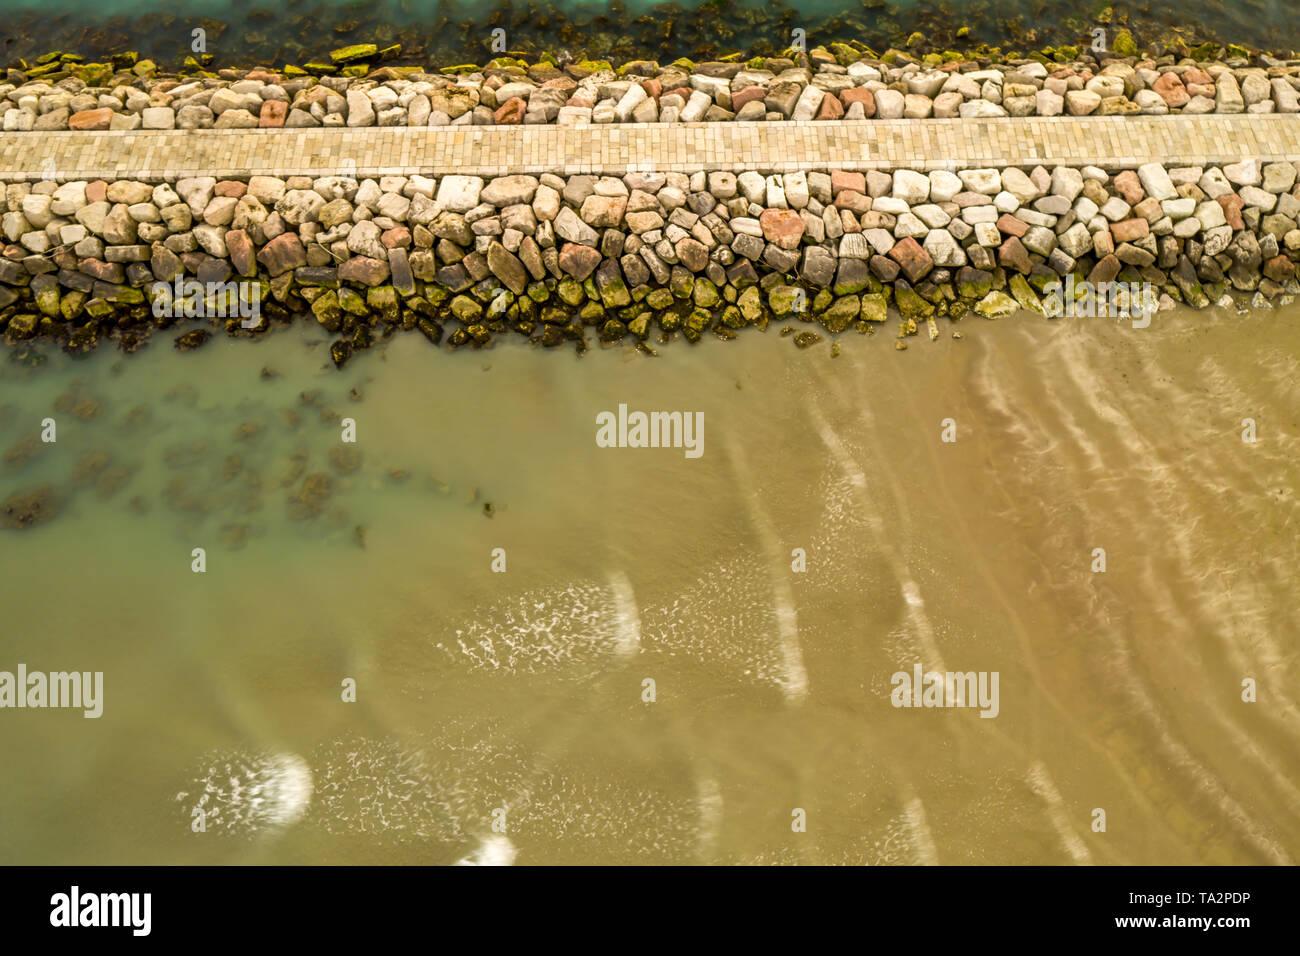 lignano sabbiadoro beacon lighthouse, piece of pier in long exposure. Perfect for your desktop photo - Stock Image